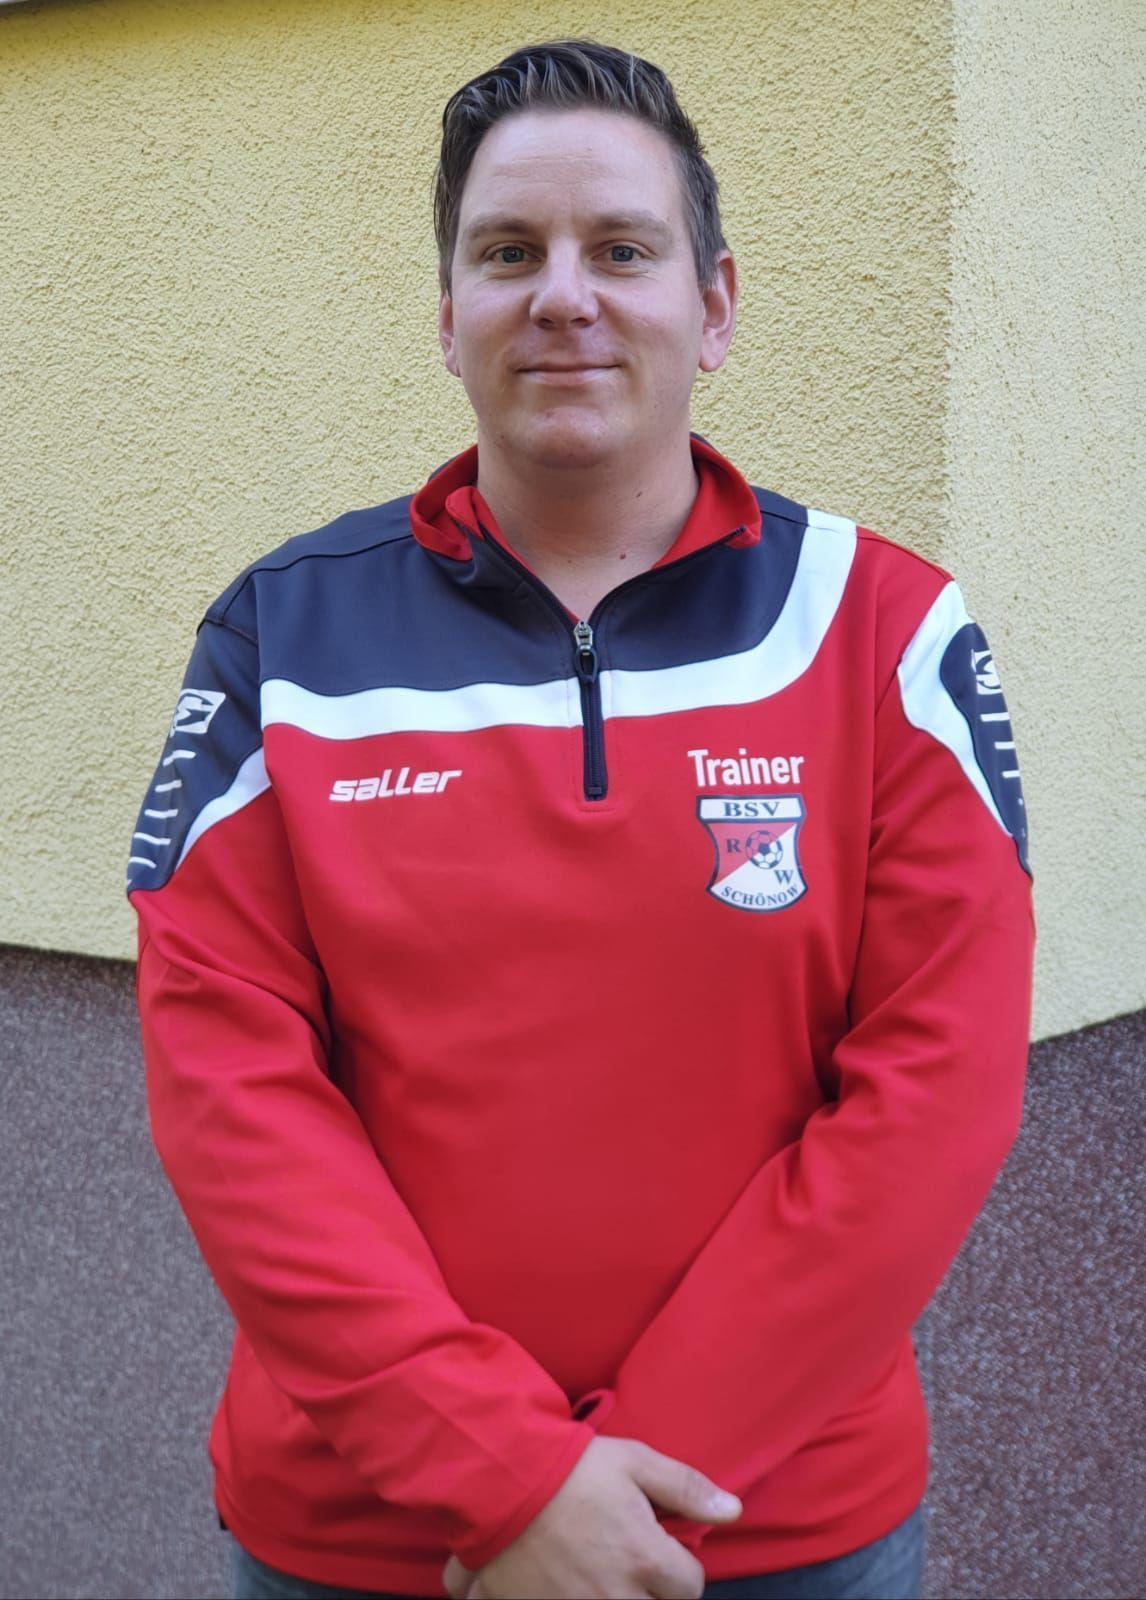 F2 - Junioren U8 (Jahrgang 2013)